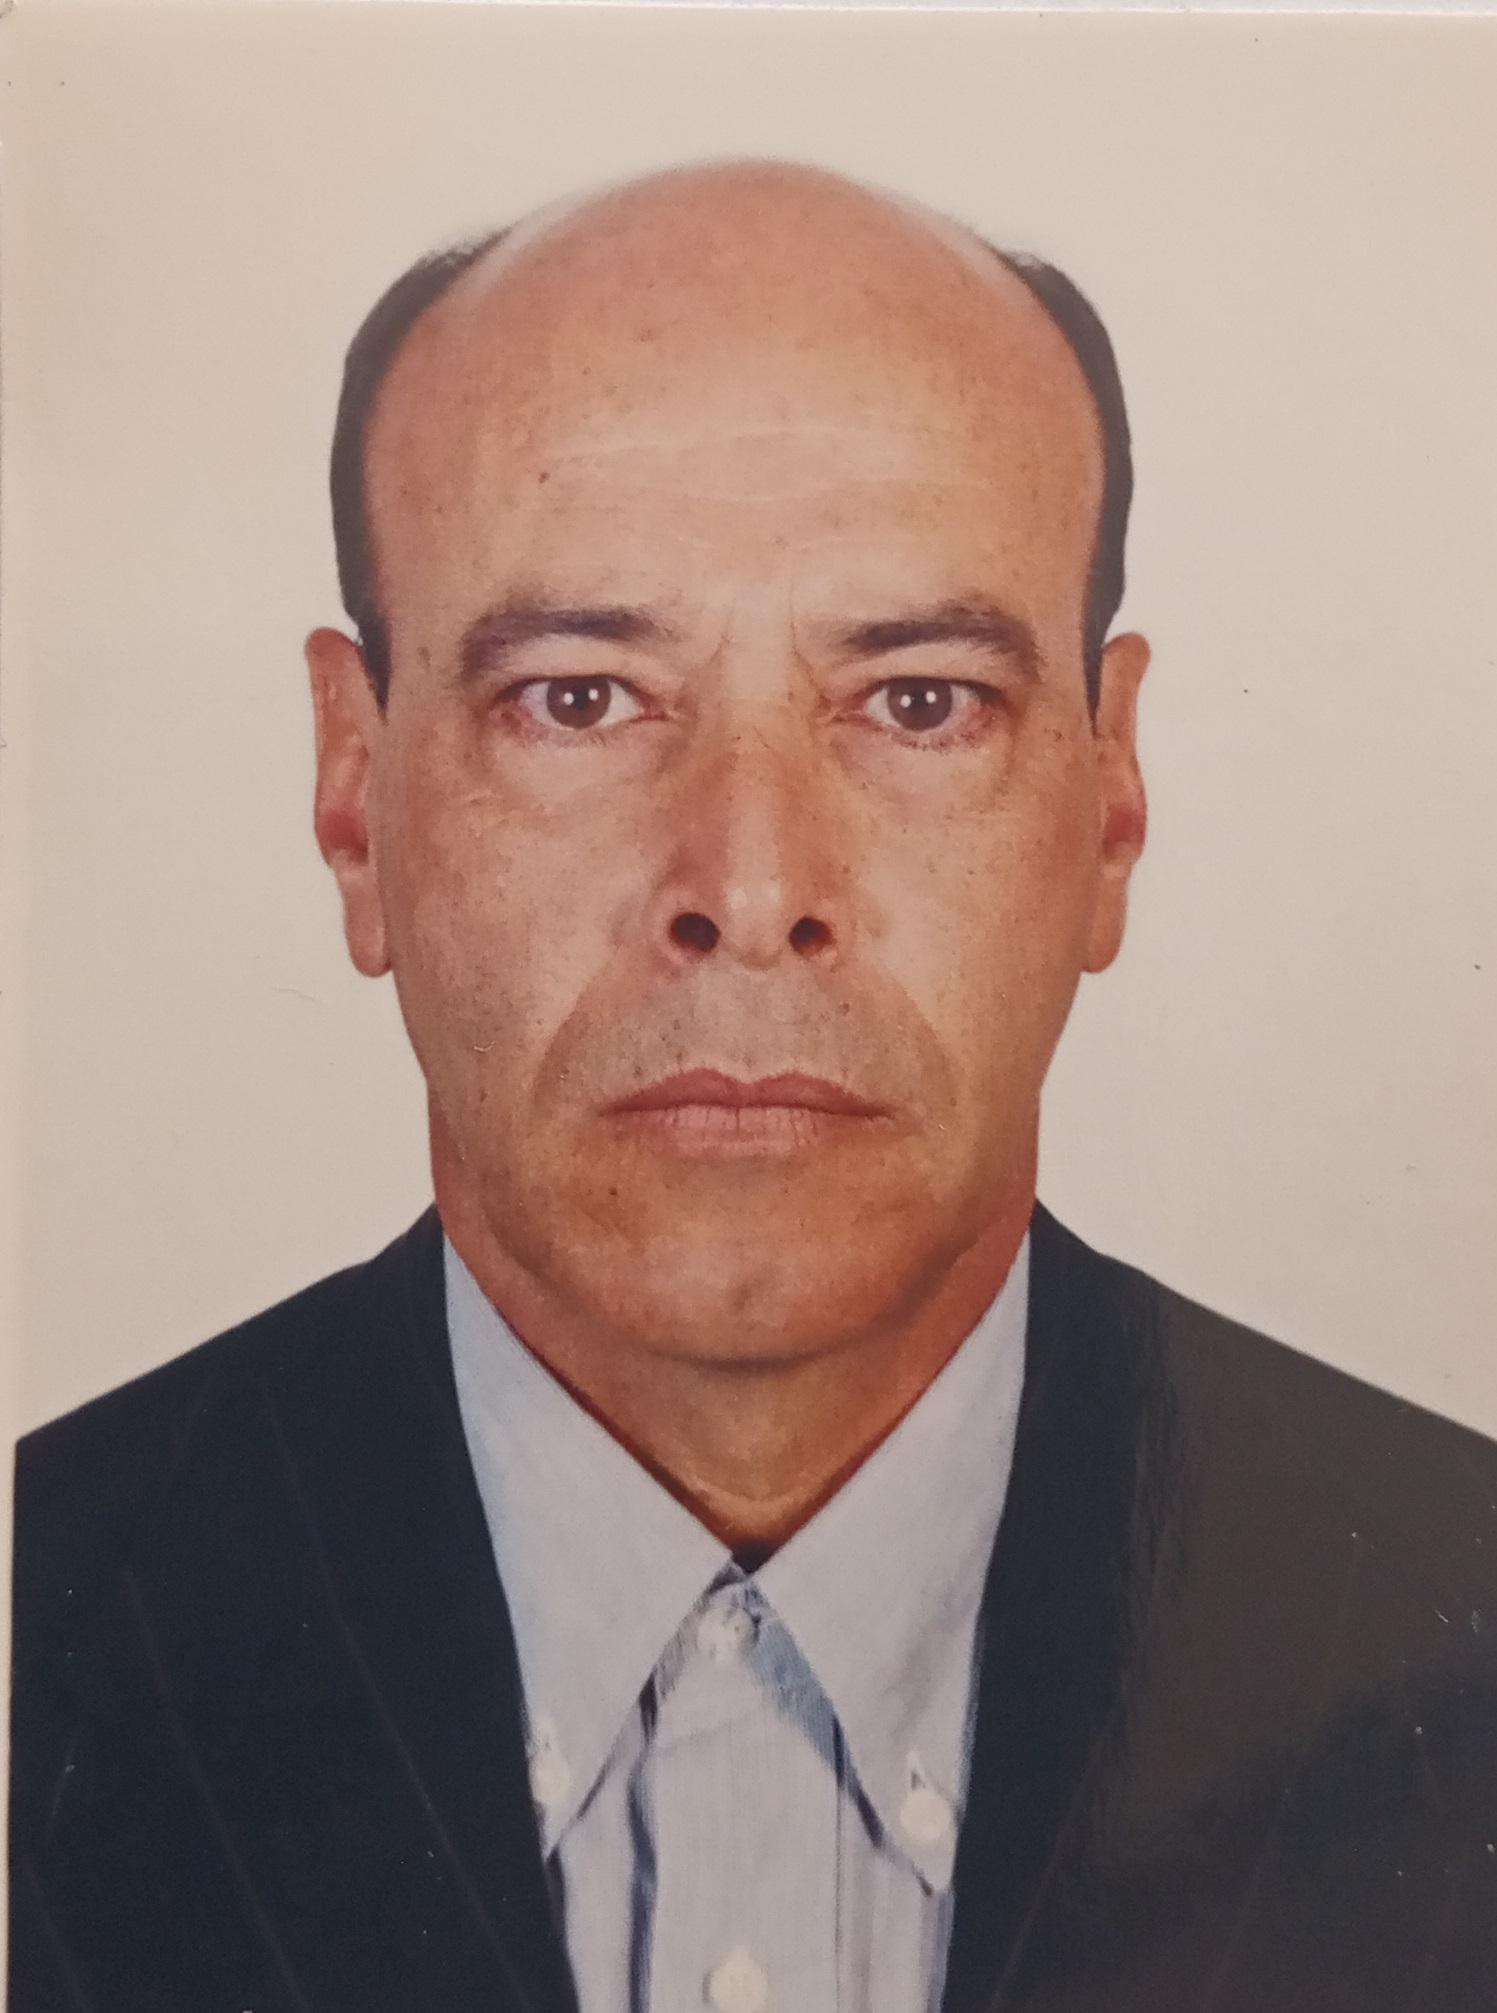 Eduardo Machado Tupynambá - OAB 17.561